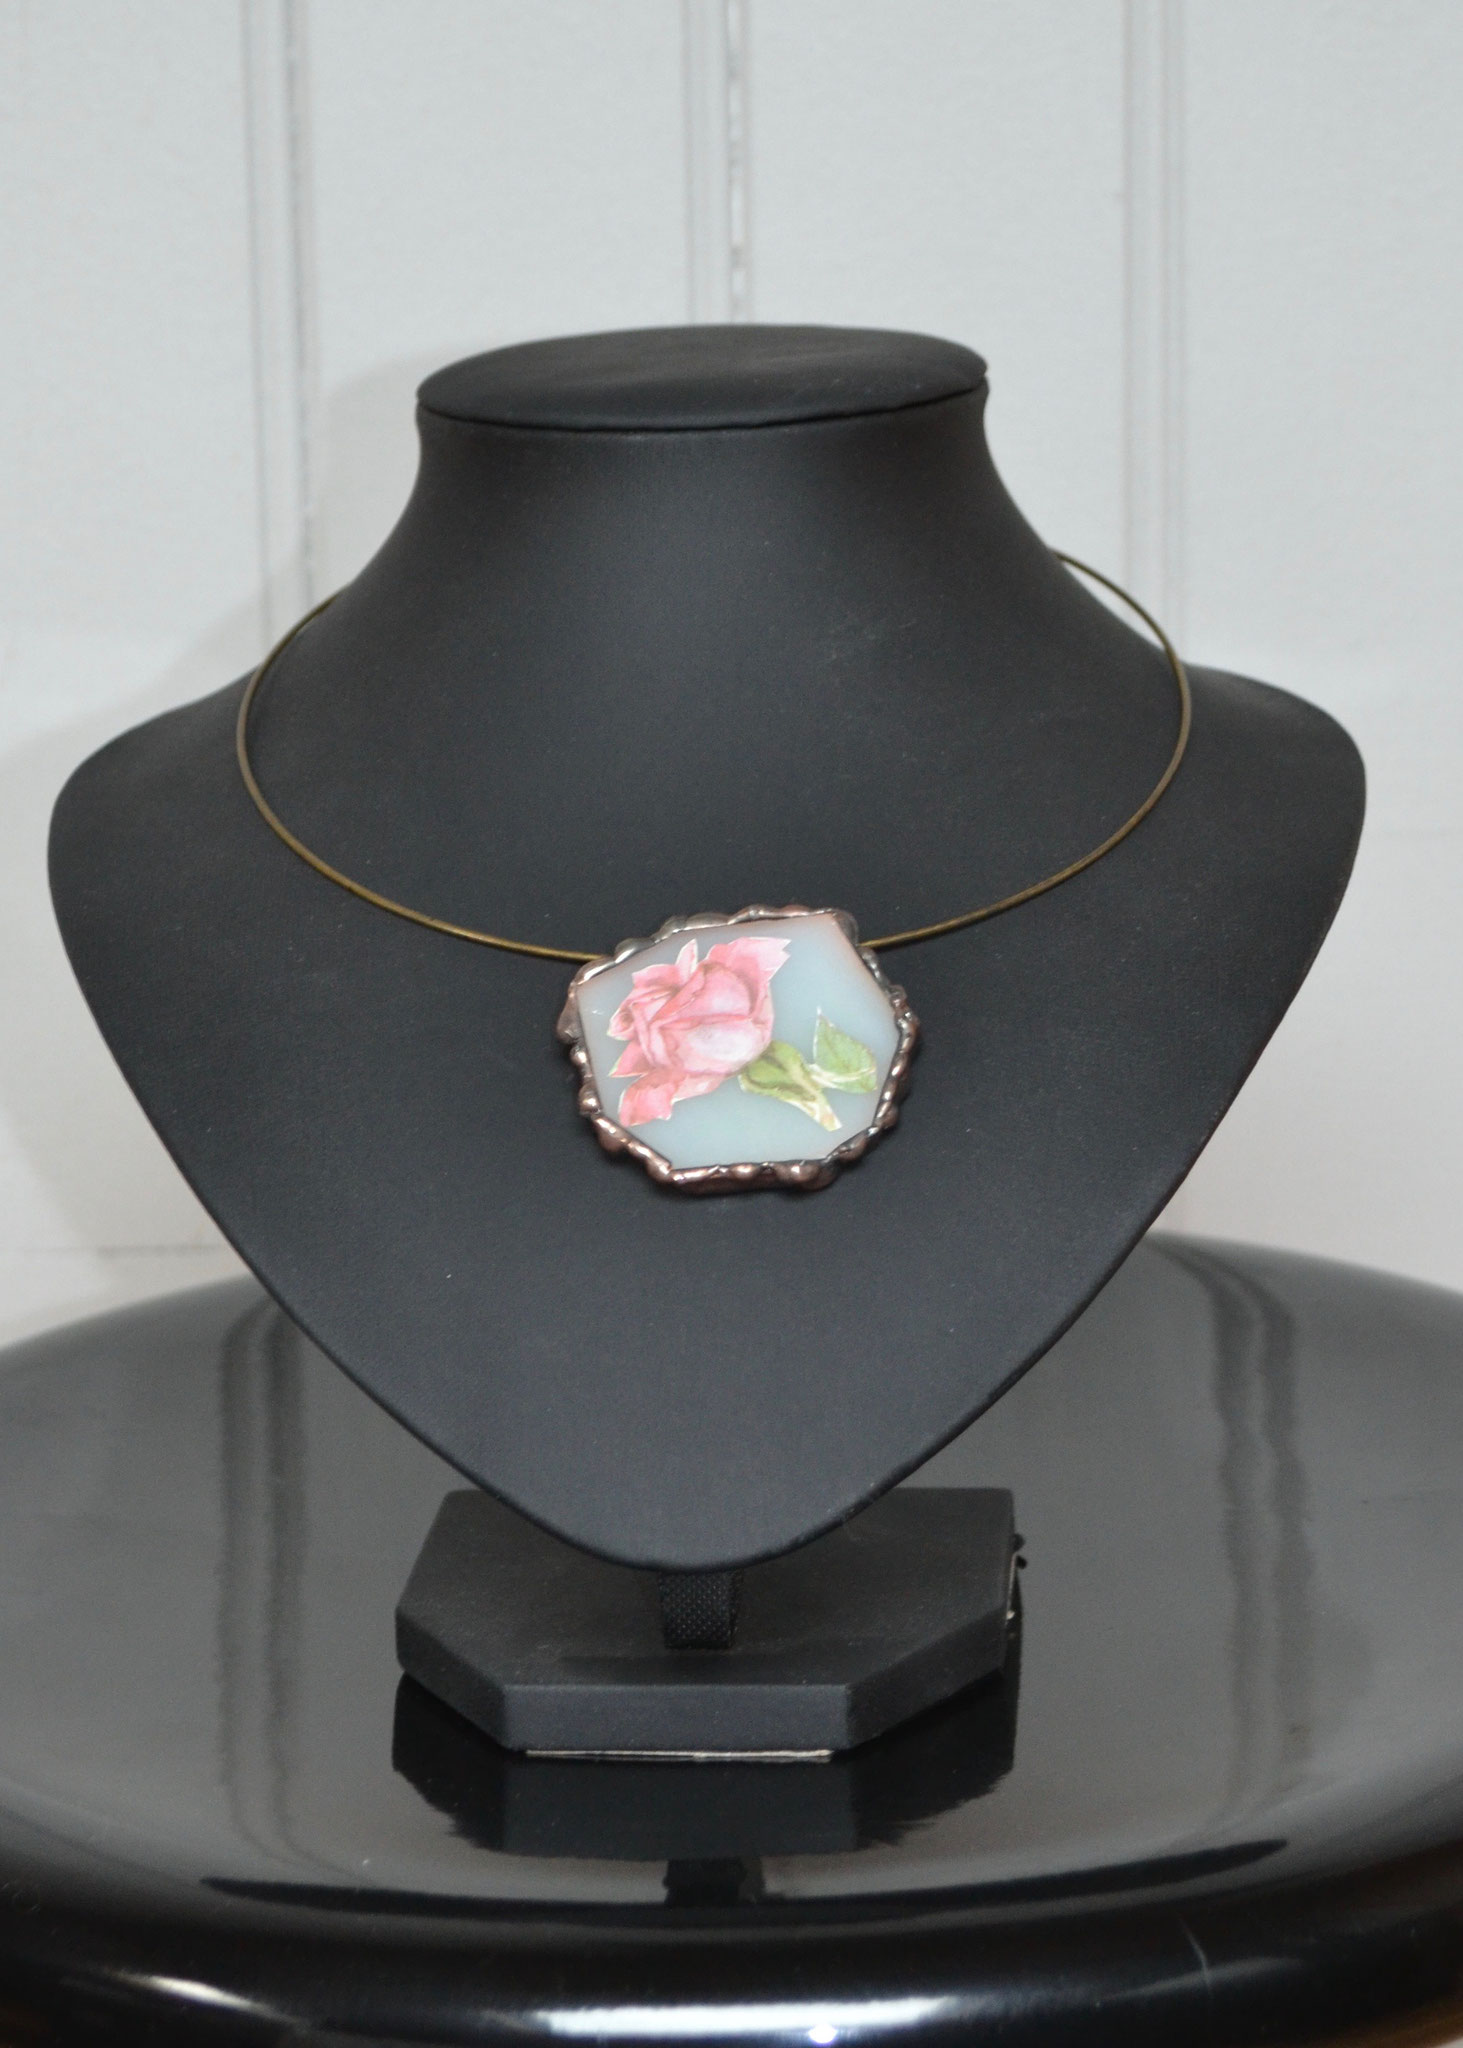 Pendentif Tiffany inclusion image rose (4,5 x 4,5 cm) 19€